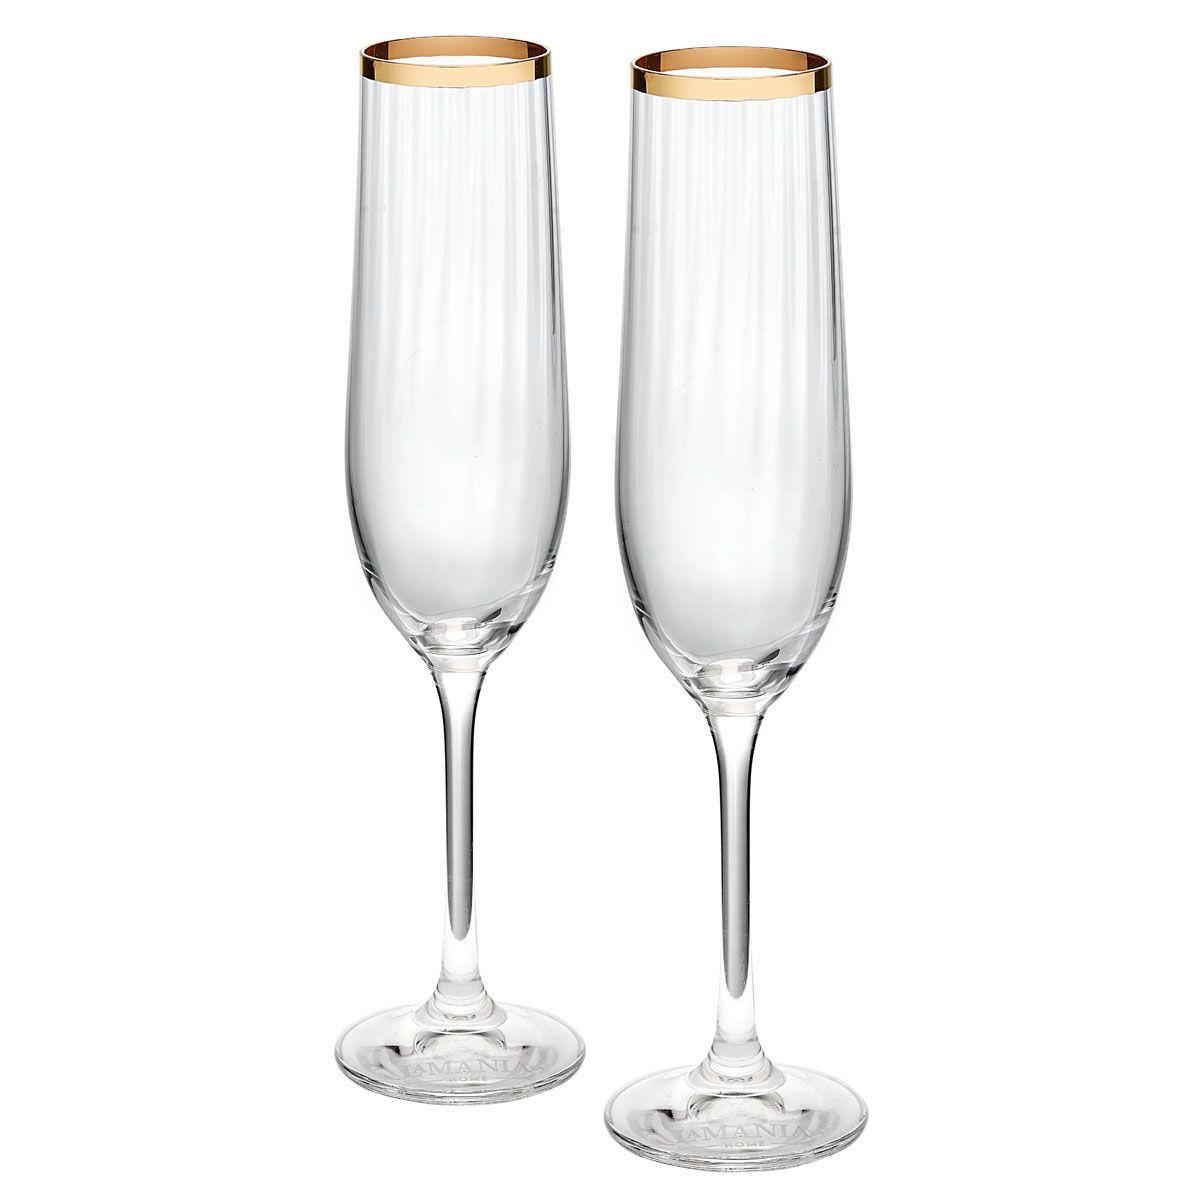 Kieliszki do szampana Spiral 2 sztuki